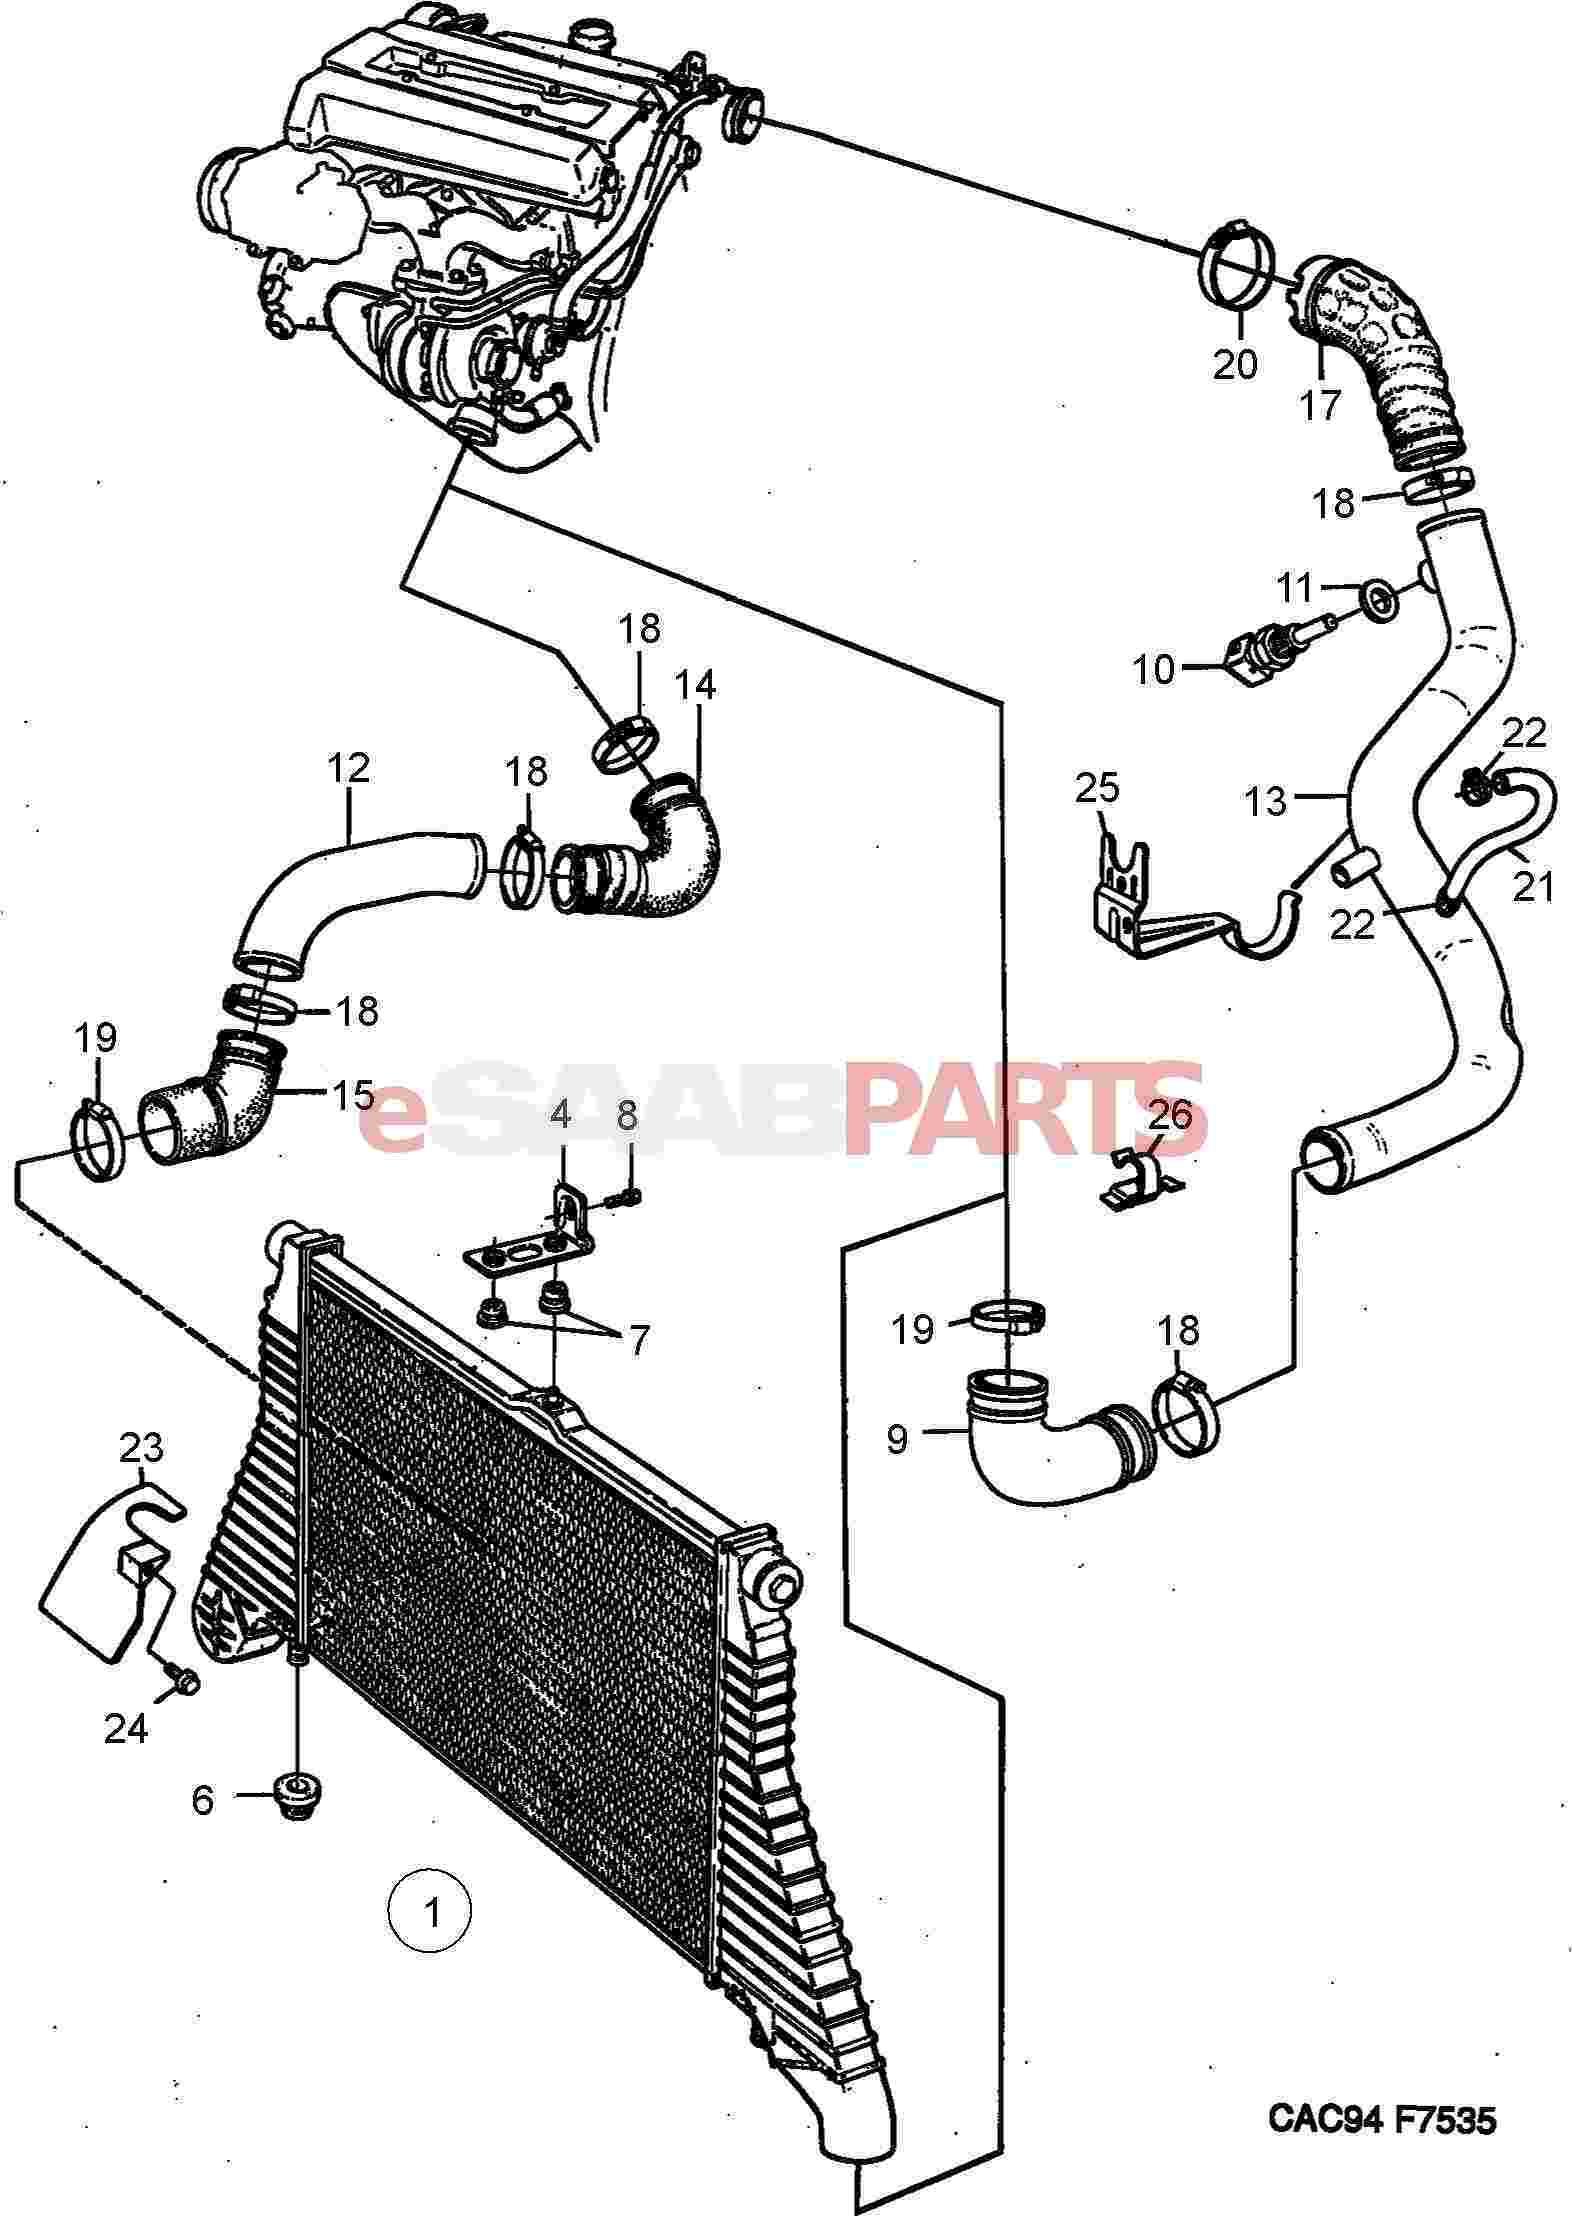 2006 f150 starter wiring diagram parts of a flower ks2 1987 ford f 150 fuse box html imageresizertool com